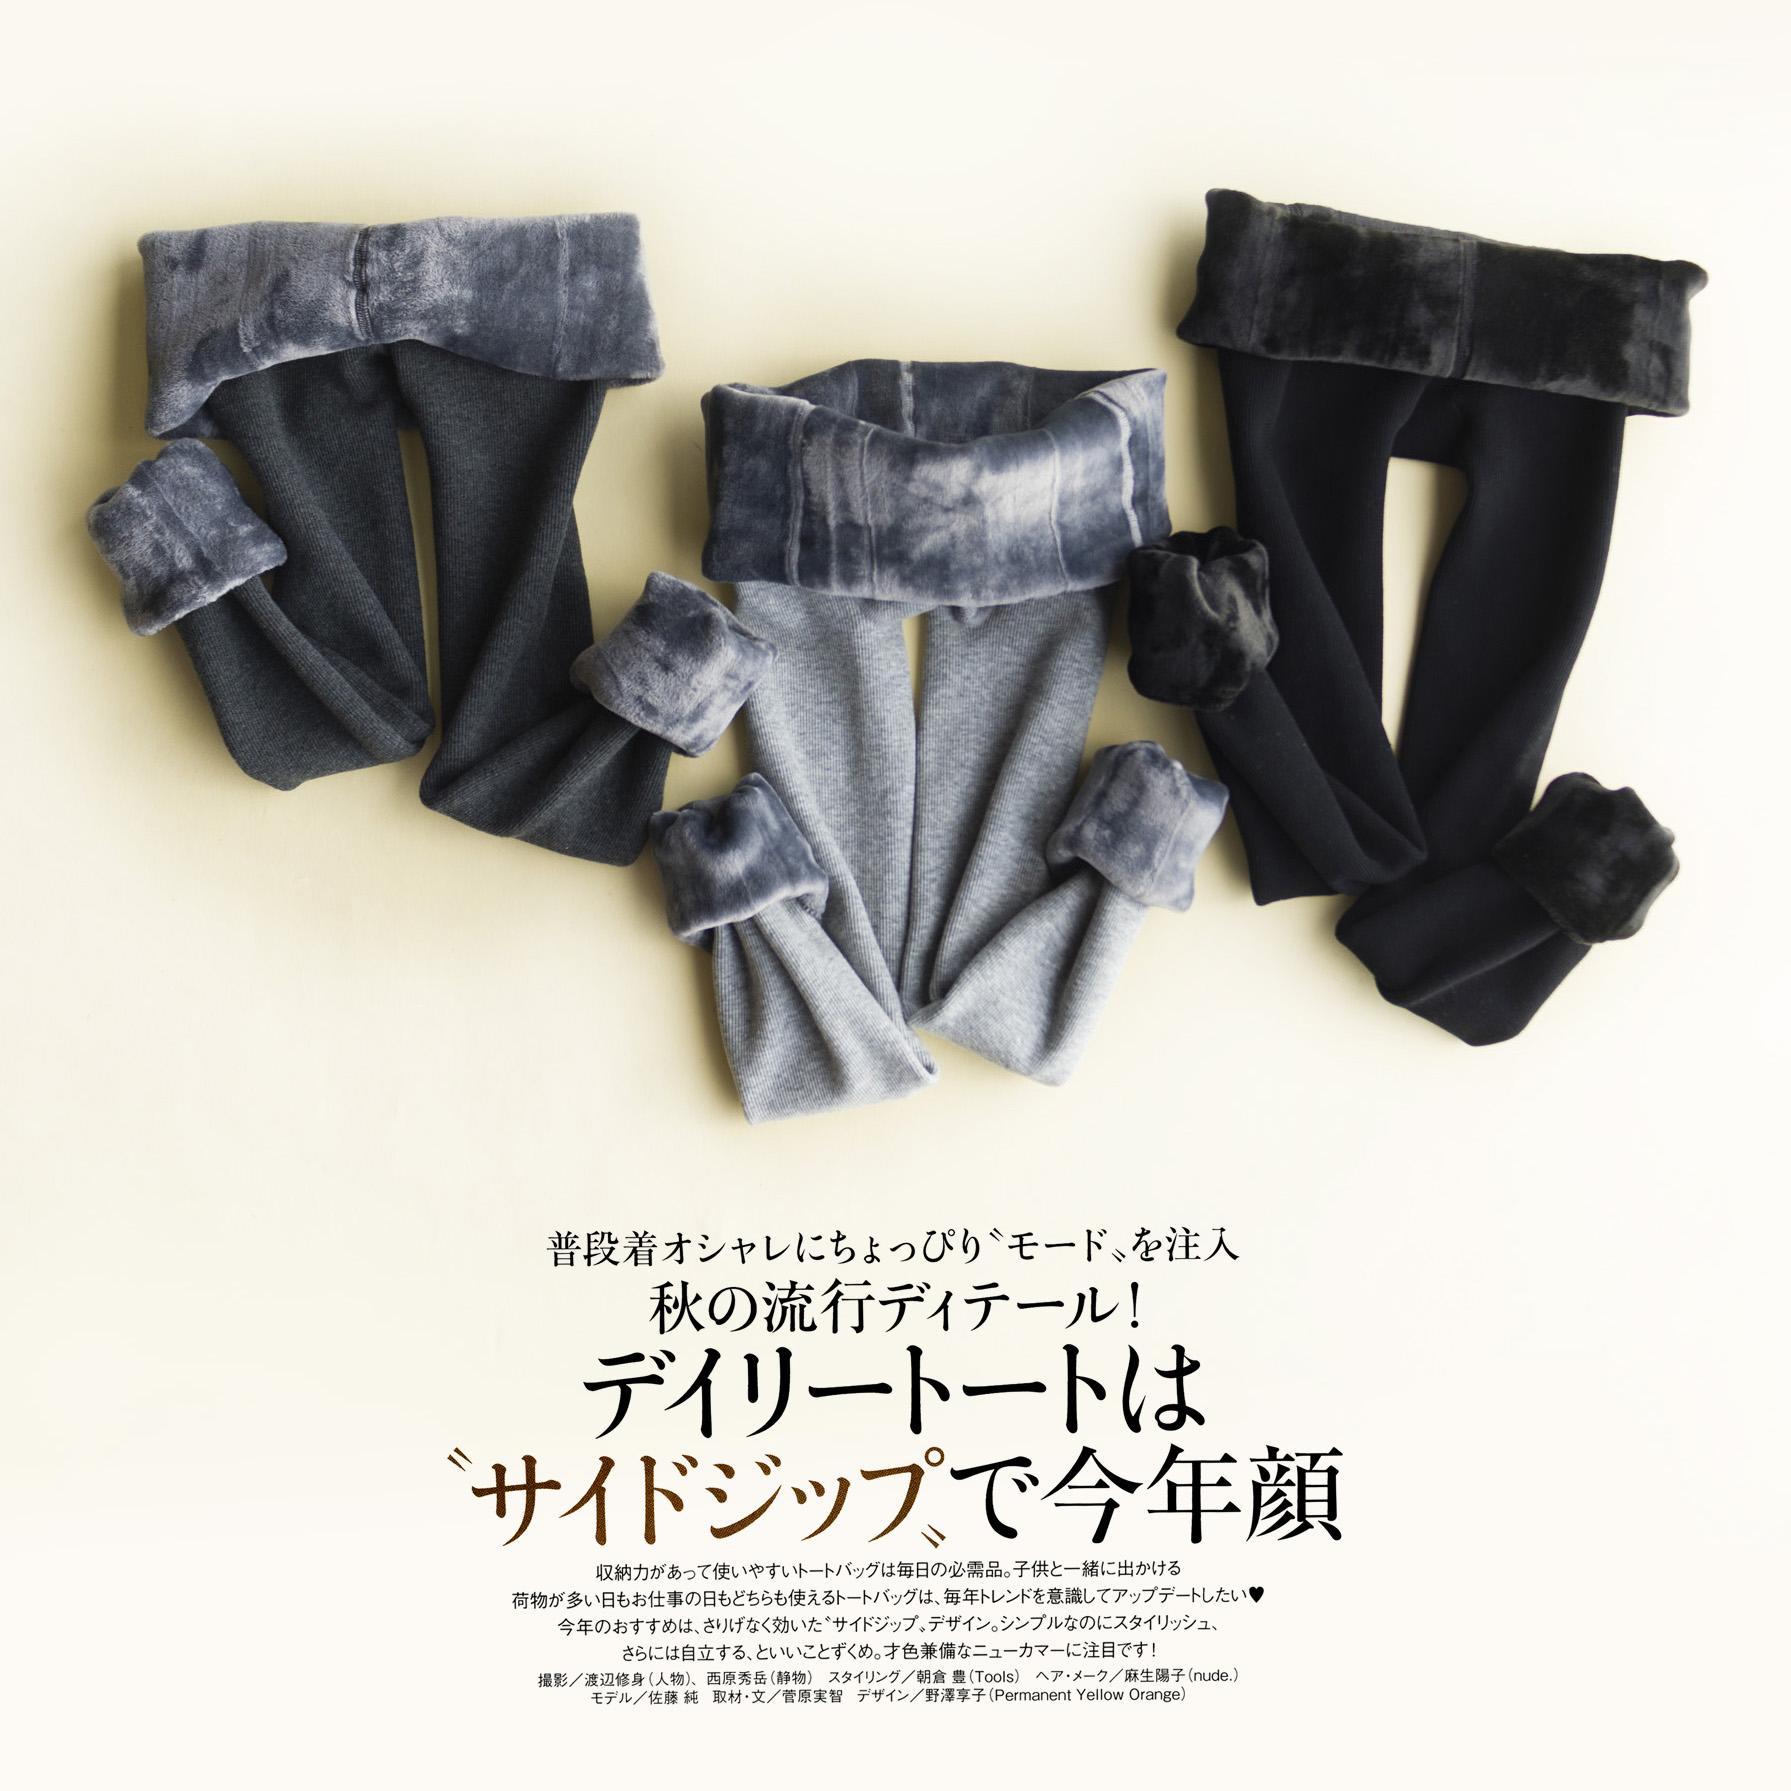 A-A11 螺纹加绒打底裤 秋冬保暖女装 防寒一体裤